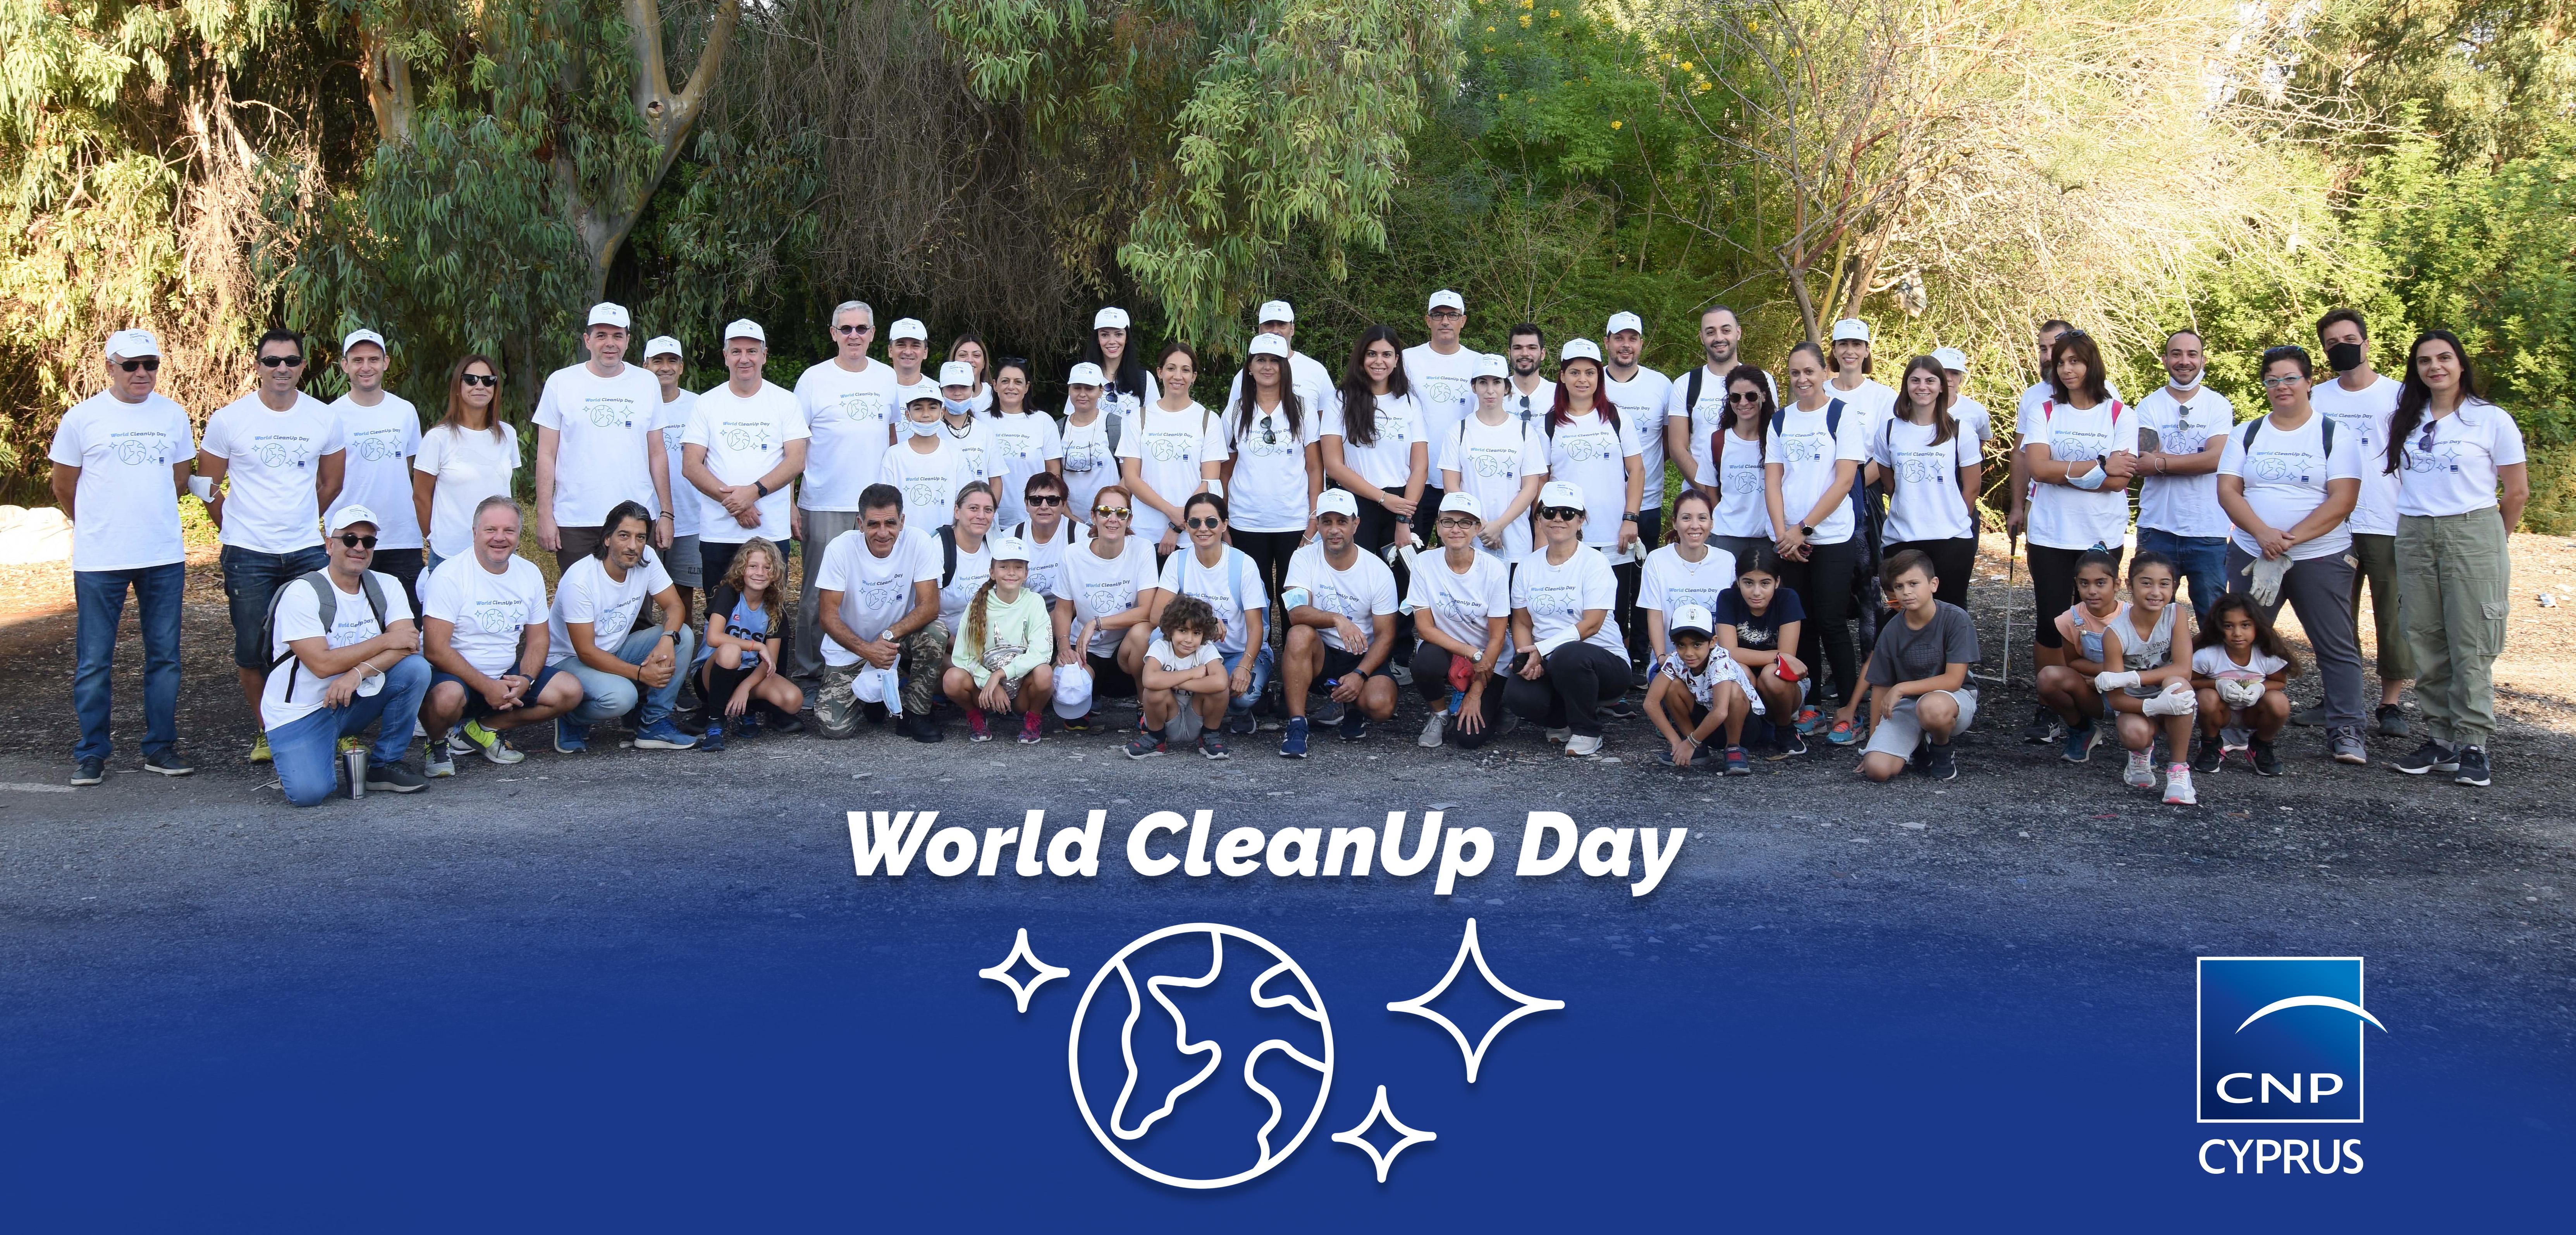 CNP Cyprus: «Ημέρα Καθαρισμού για το Περιβάλλον»